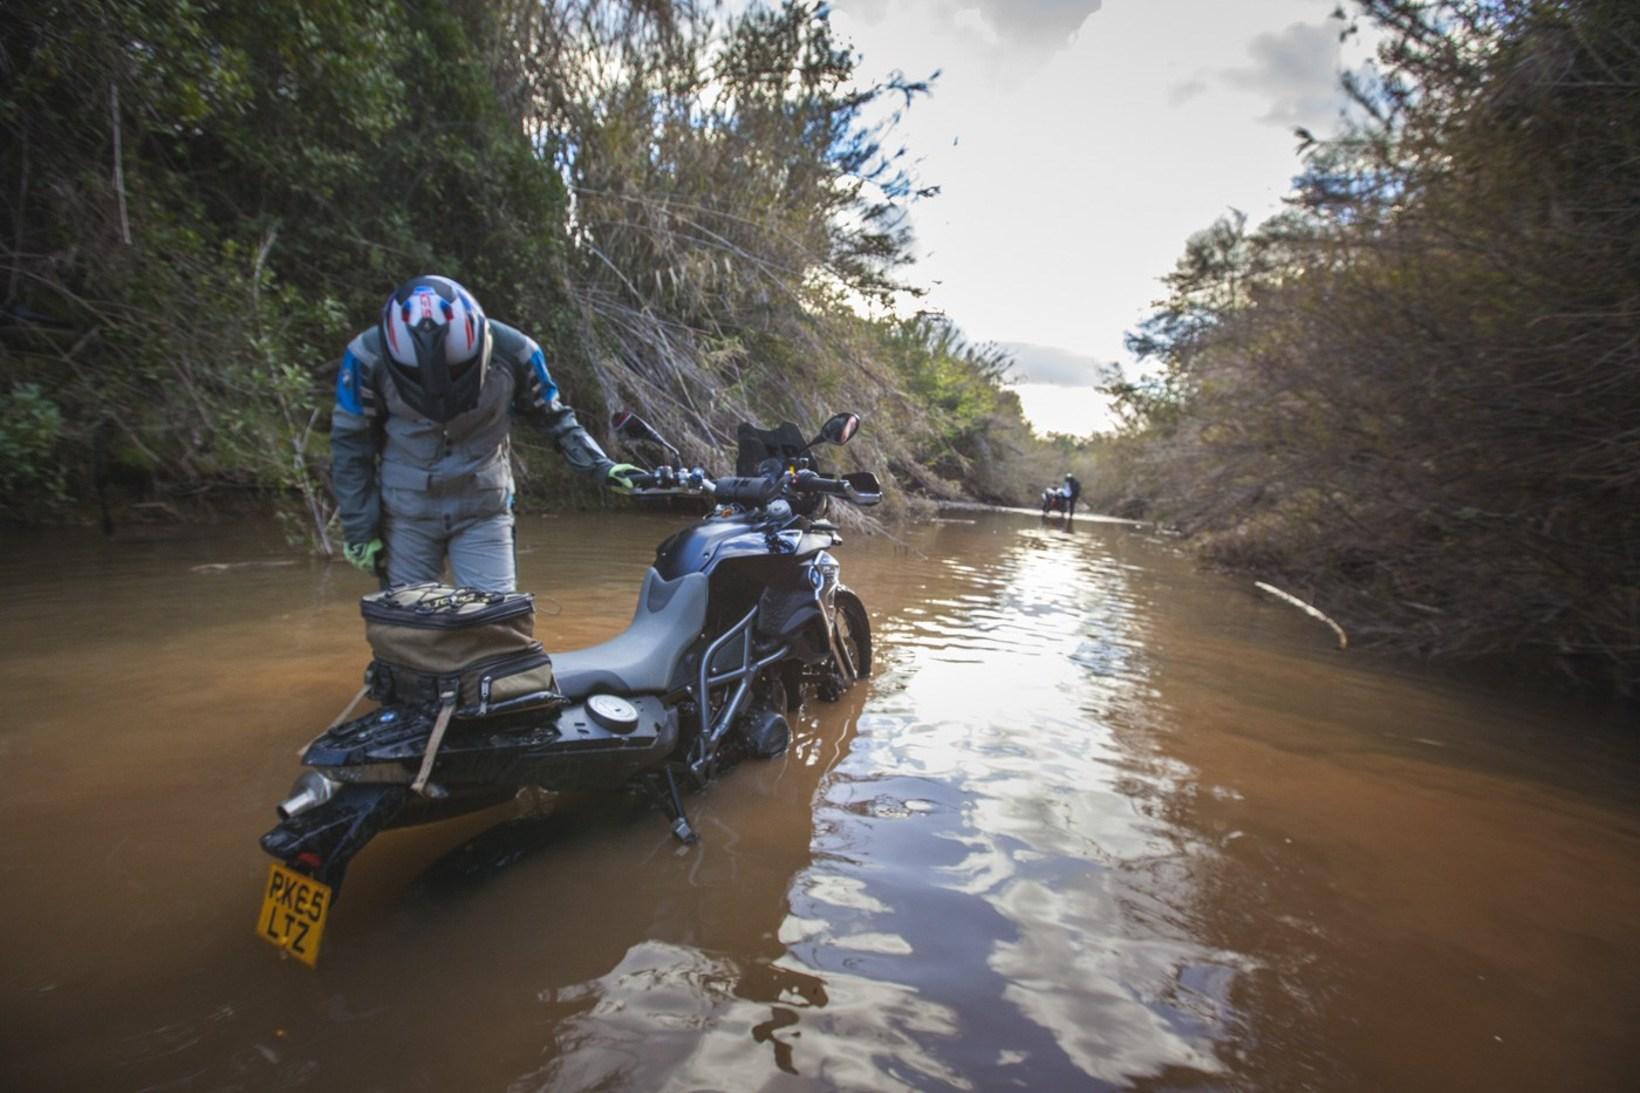 Brake Magazine – How to cross rivers